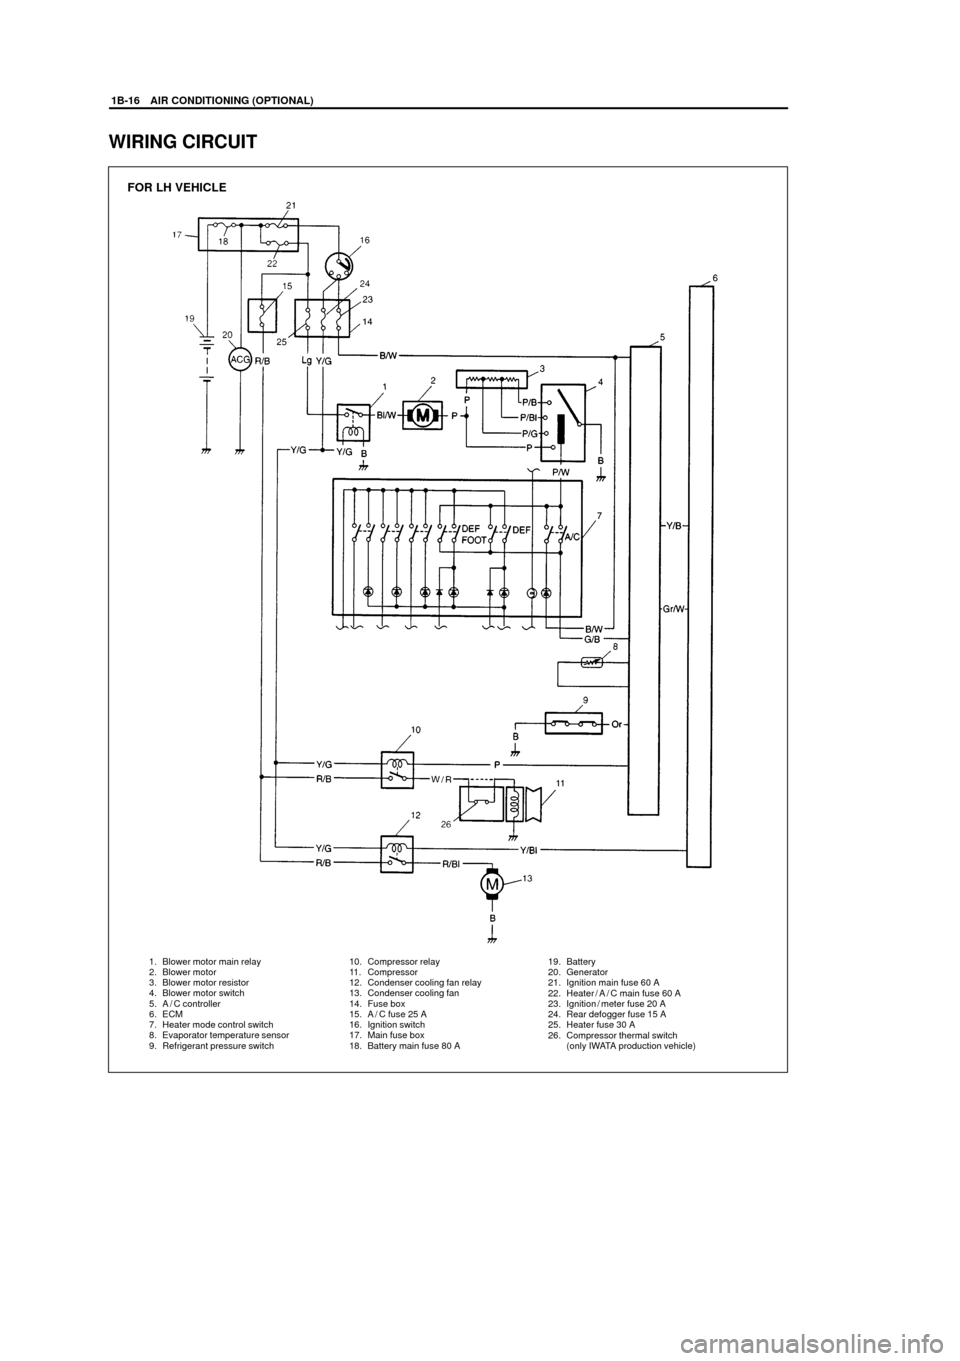 hight resolution of suzuki grand vitara 2005 2 g service workshop manual page 87